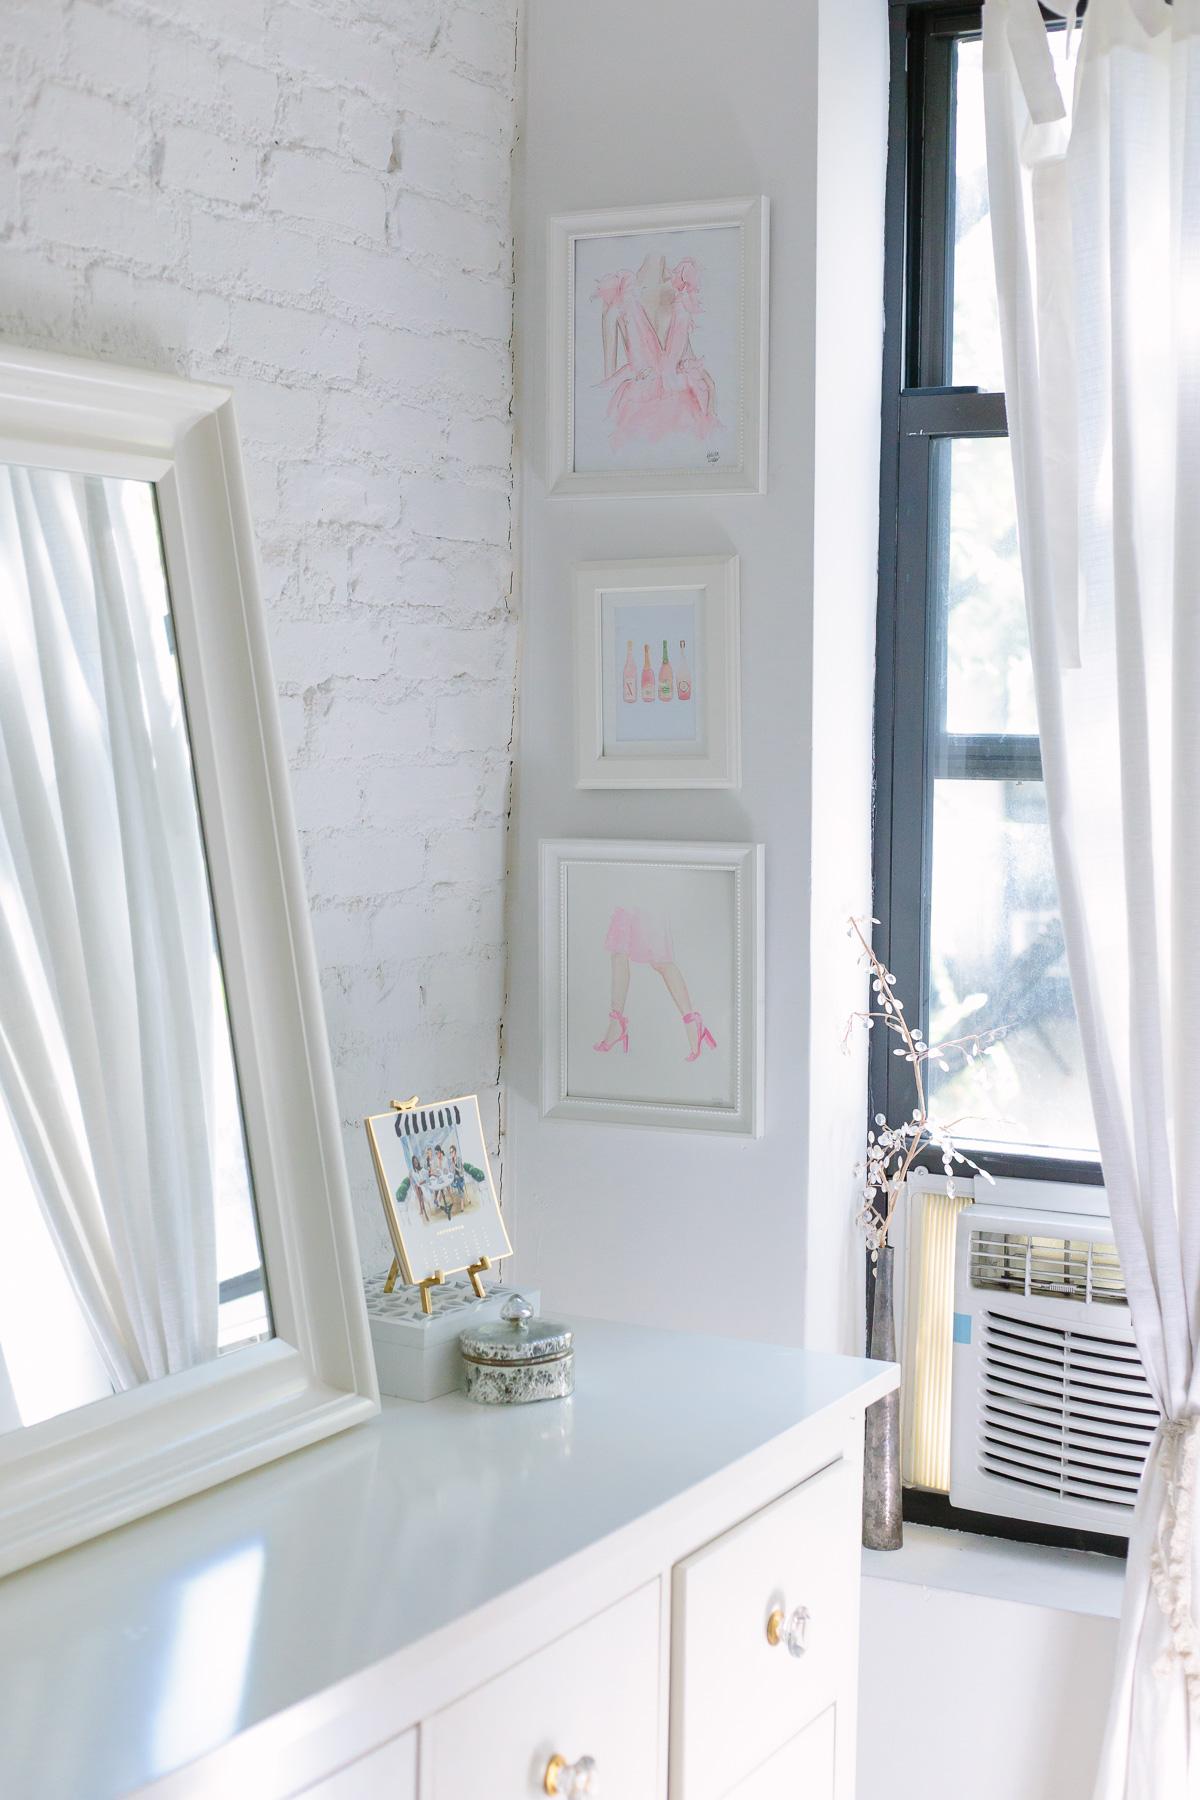 nyc-studio-apartment-white-brick-wall-5887